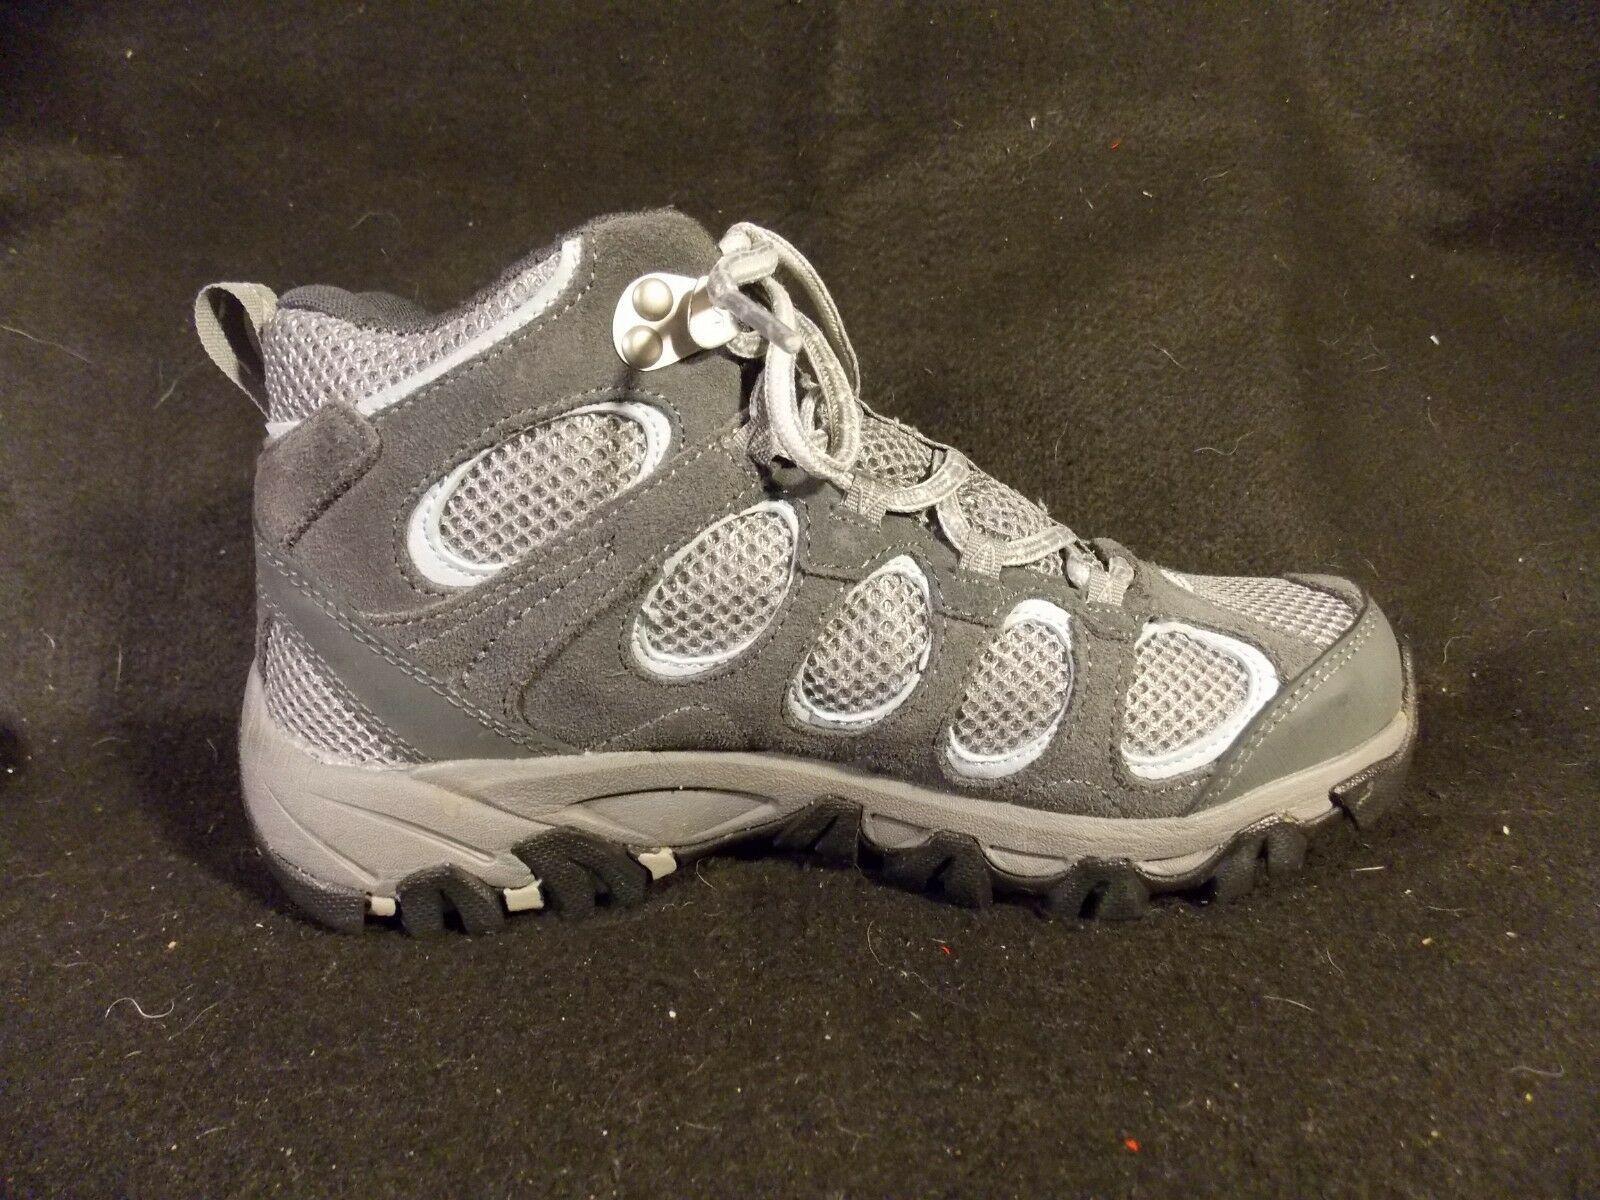 Women's Merrell Hilltop Vent Waterproof Castle Rock Gray Hiking Shoes Size 6 image 3